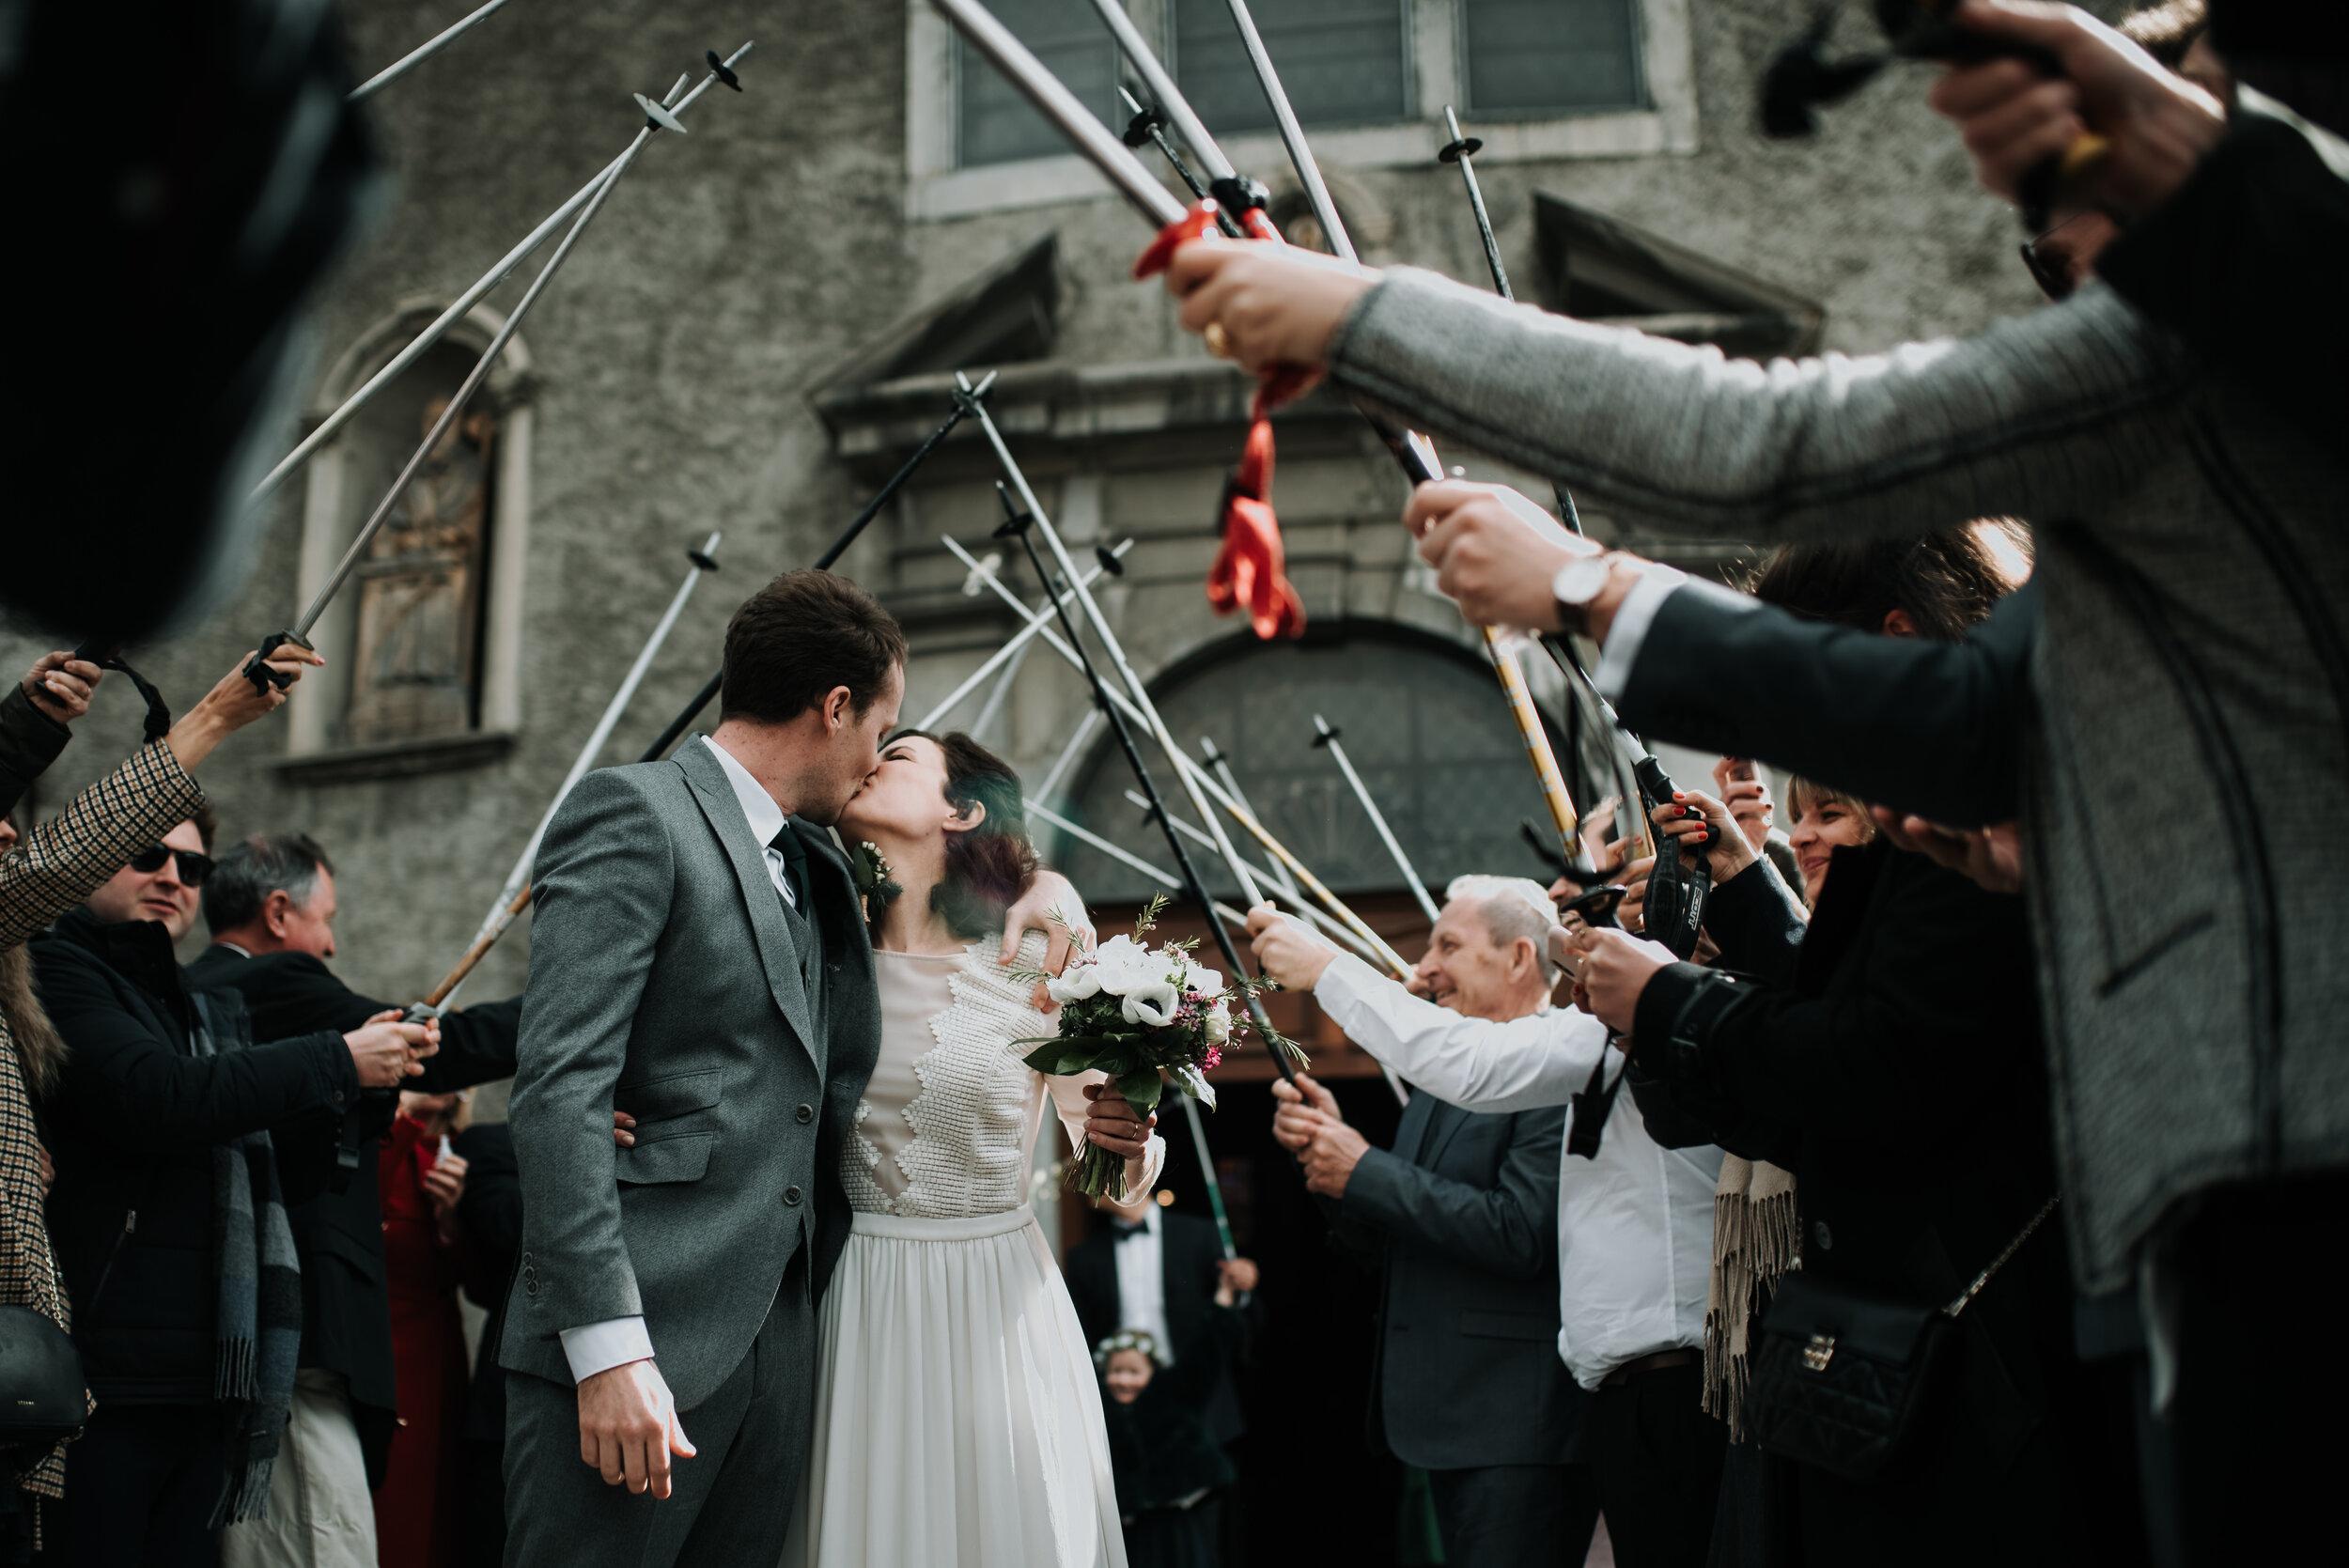 Léa-Fery-Photographe-Bretagne-Mariage-Famille-4441.jpg